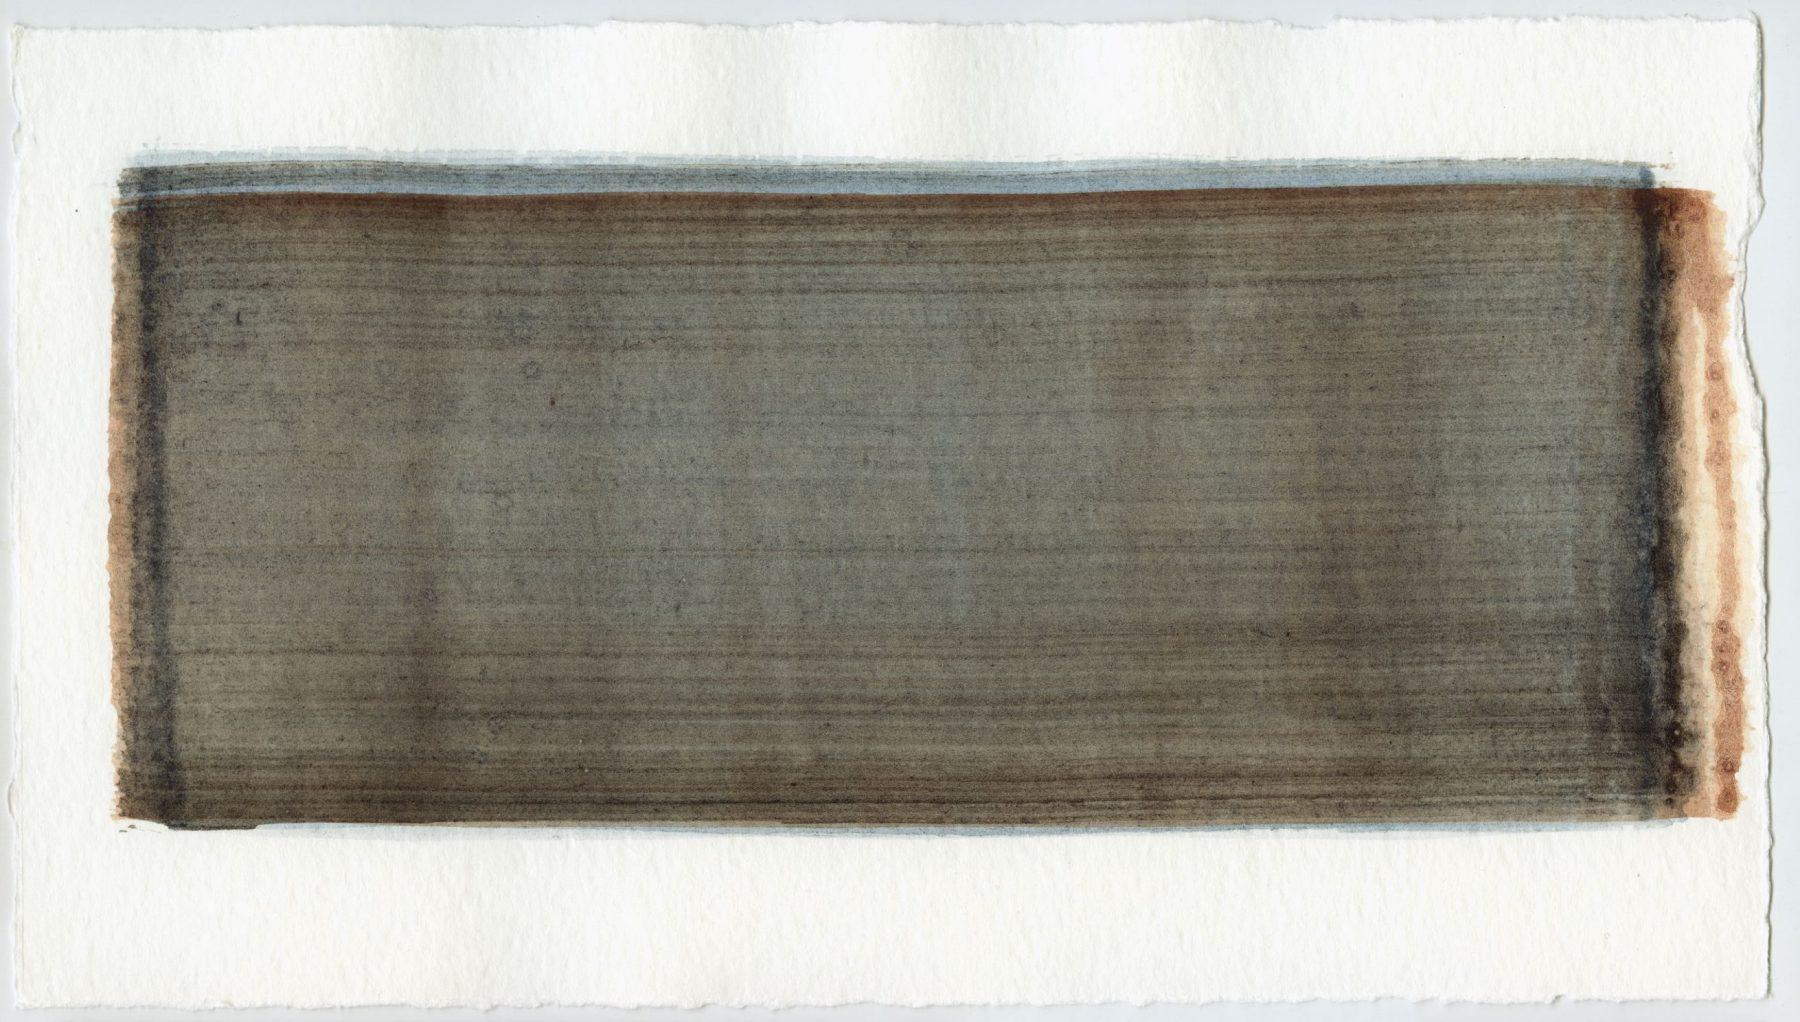 Brush stroke no. 72 - Pigment: Vivianiet (from Kremer Pigmente) Selfmade pigment: IJzeroer gebrand